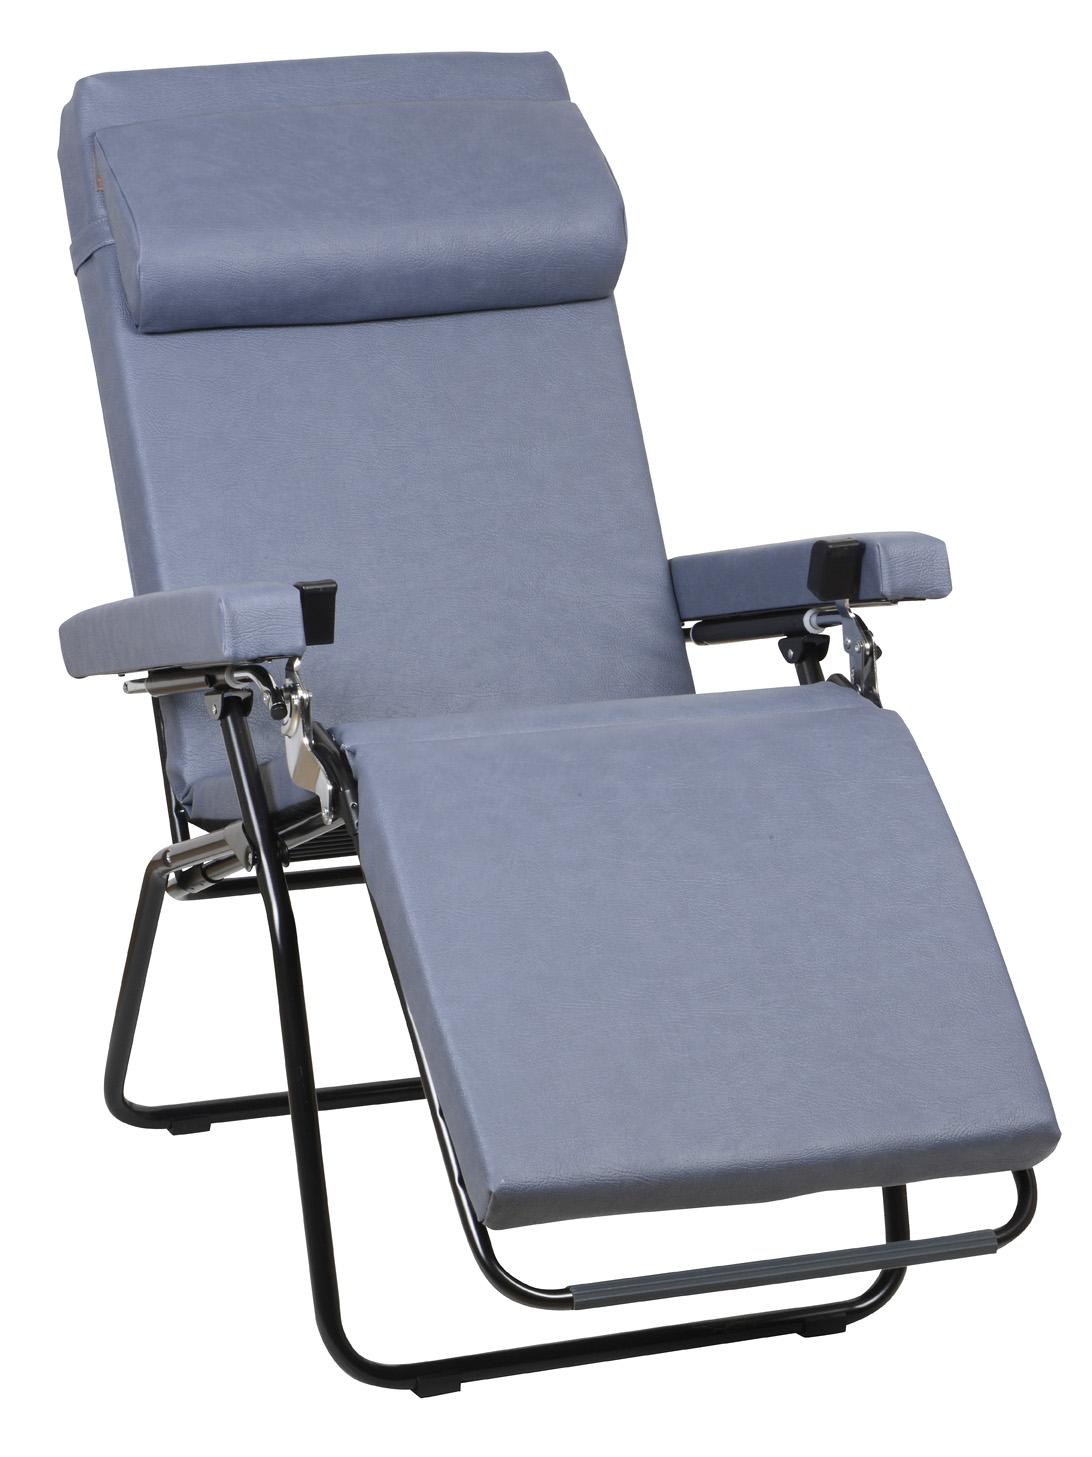 Lafuma fauteuil relax rpl 6 cm synth tique m2 bleu temp - Bain de soleil lafuma ...